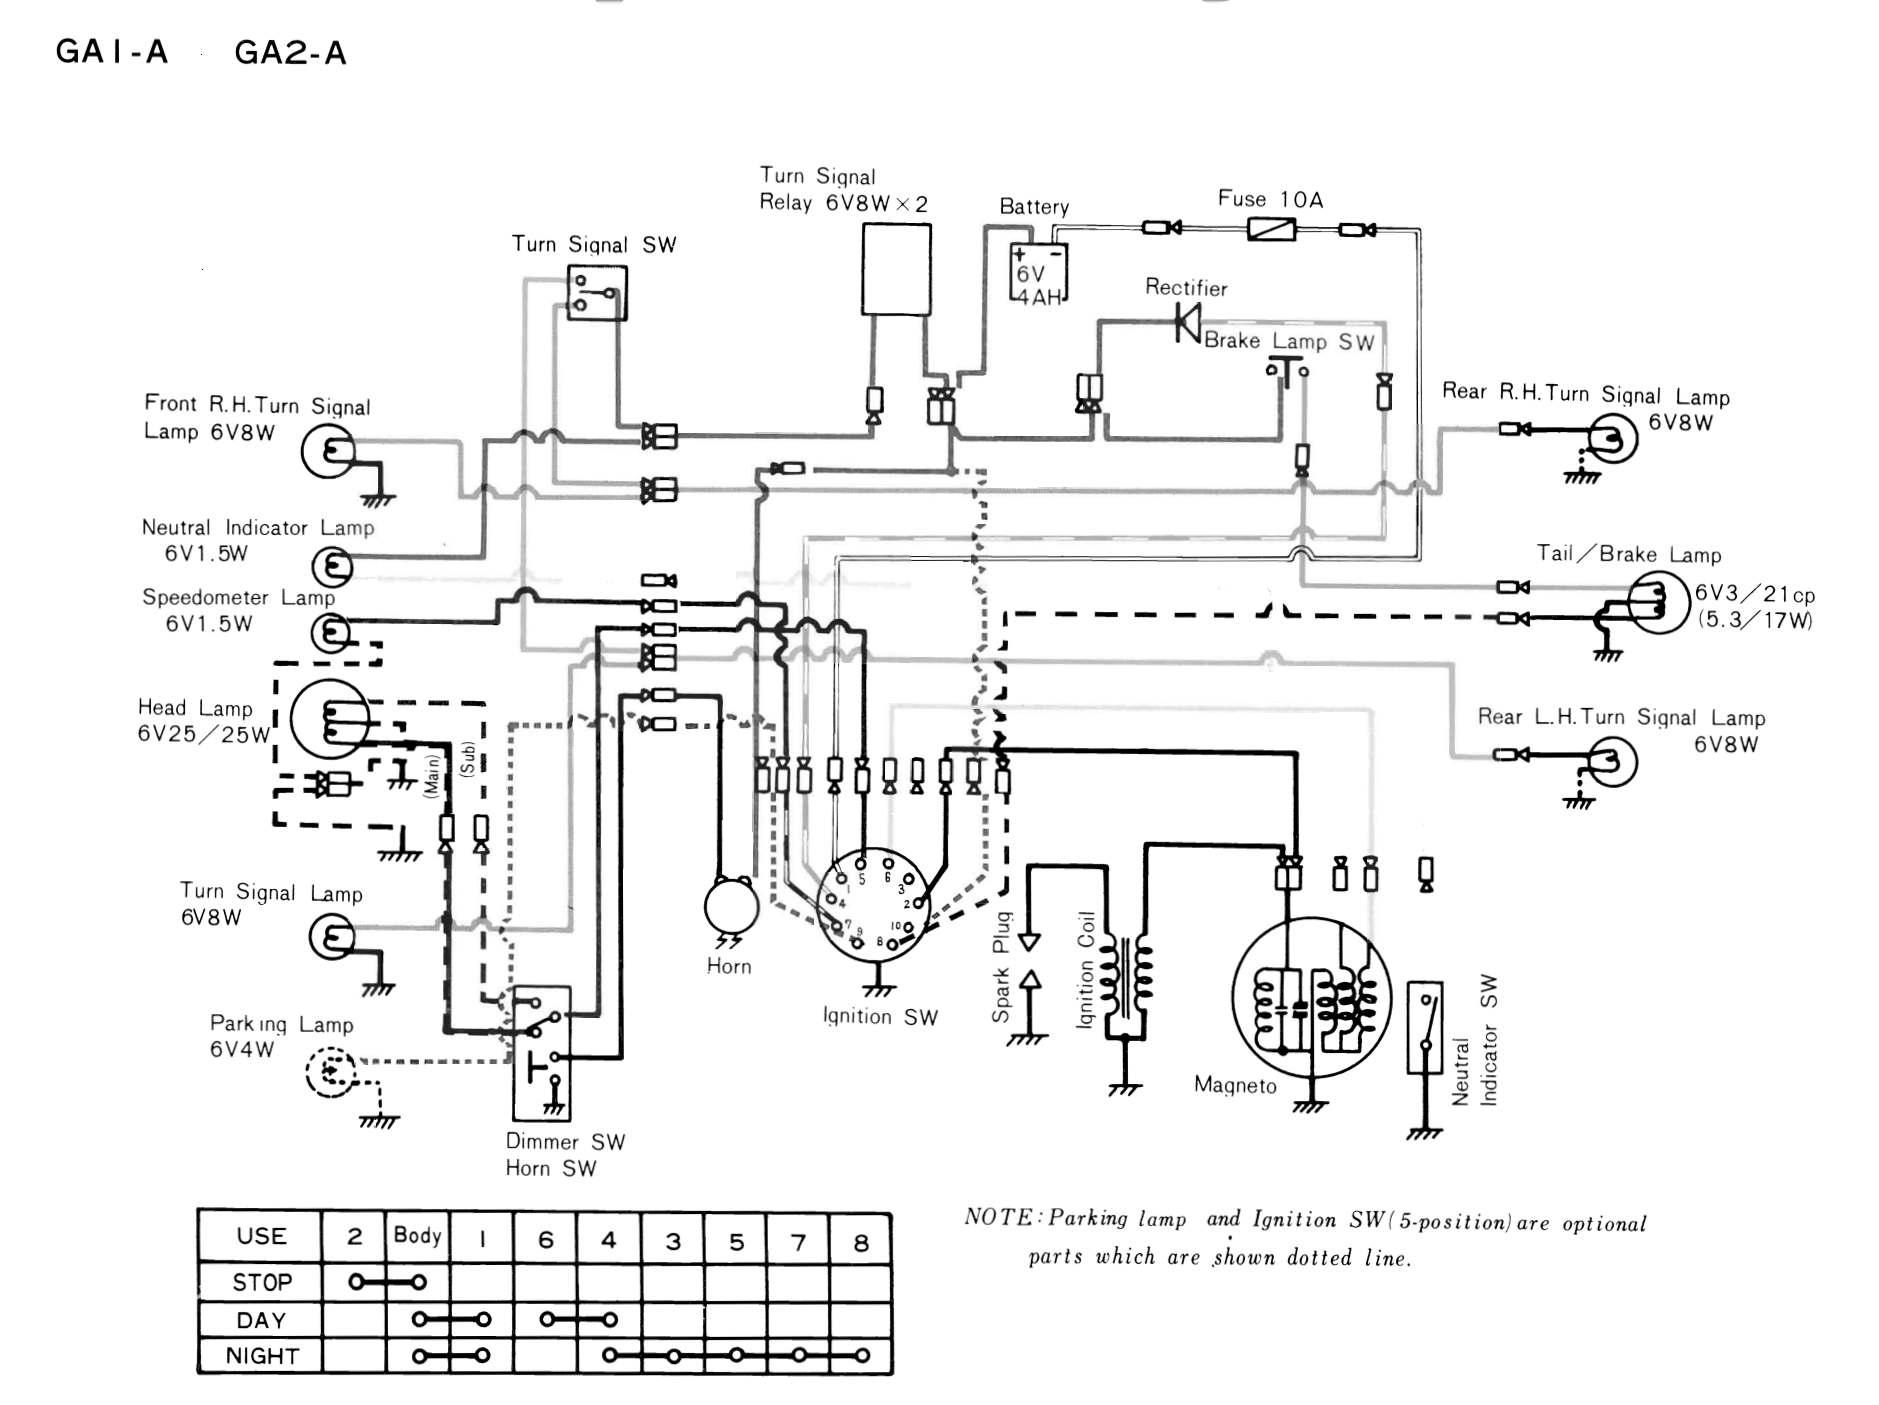 hight resolution of  dod wiring diagram standard all kind of wiring diagrams u2022 vehicle wiring diagrams dod wiring